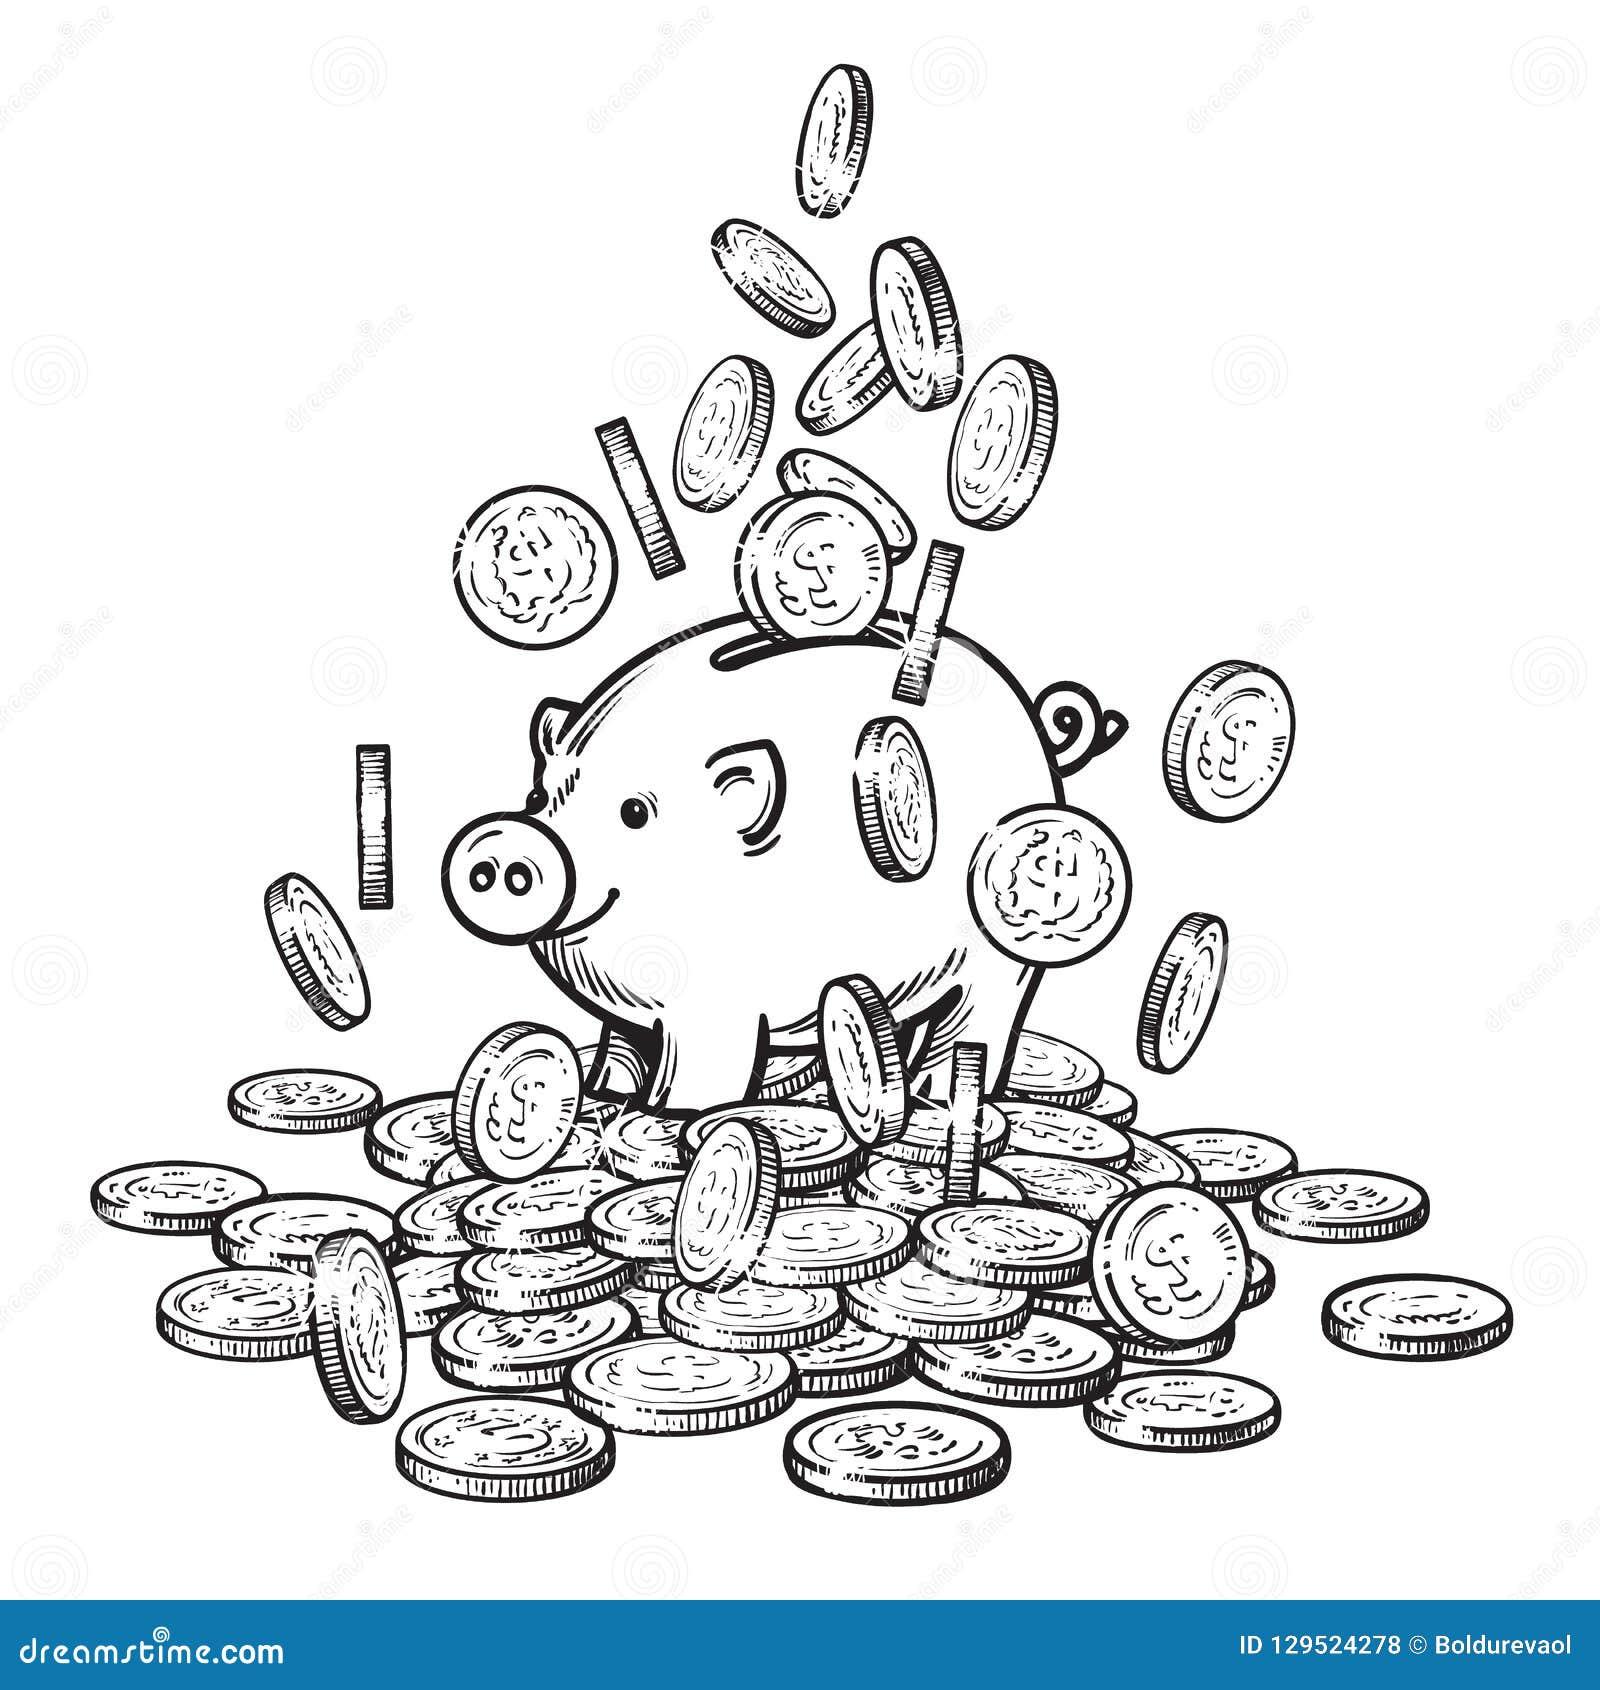 Piggy τράπεζα κινούμενων σχεδίων μεταξύ των μειωμένων νομισμάτων στο μεγάλο σωρό των χρημάτων 2019 κινεζικό νέο σύμβολο Yea Γραπτ